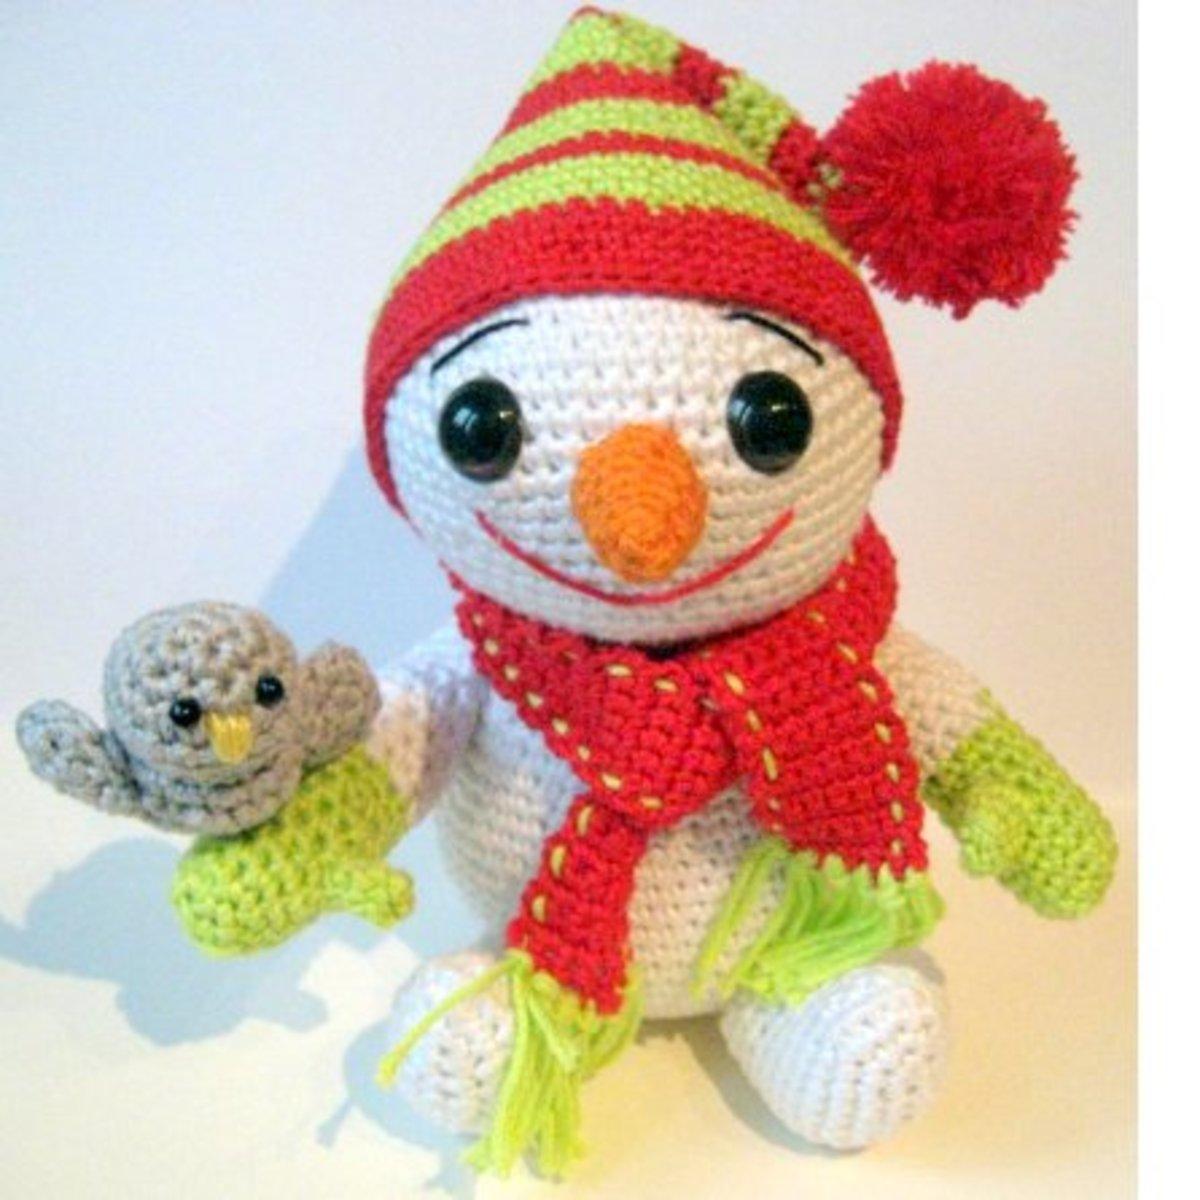 Free crochet patterns amigurumi snowman little Christmas bird.